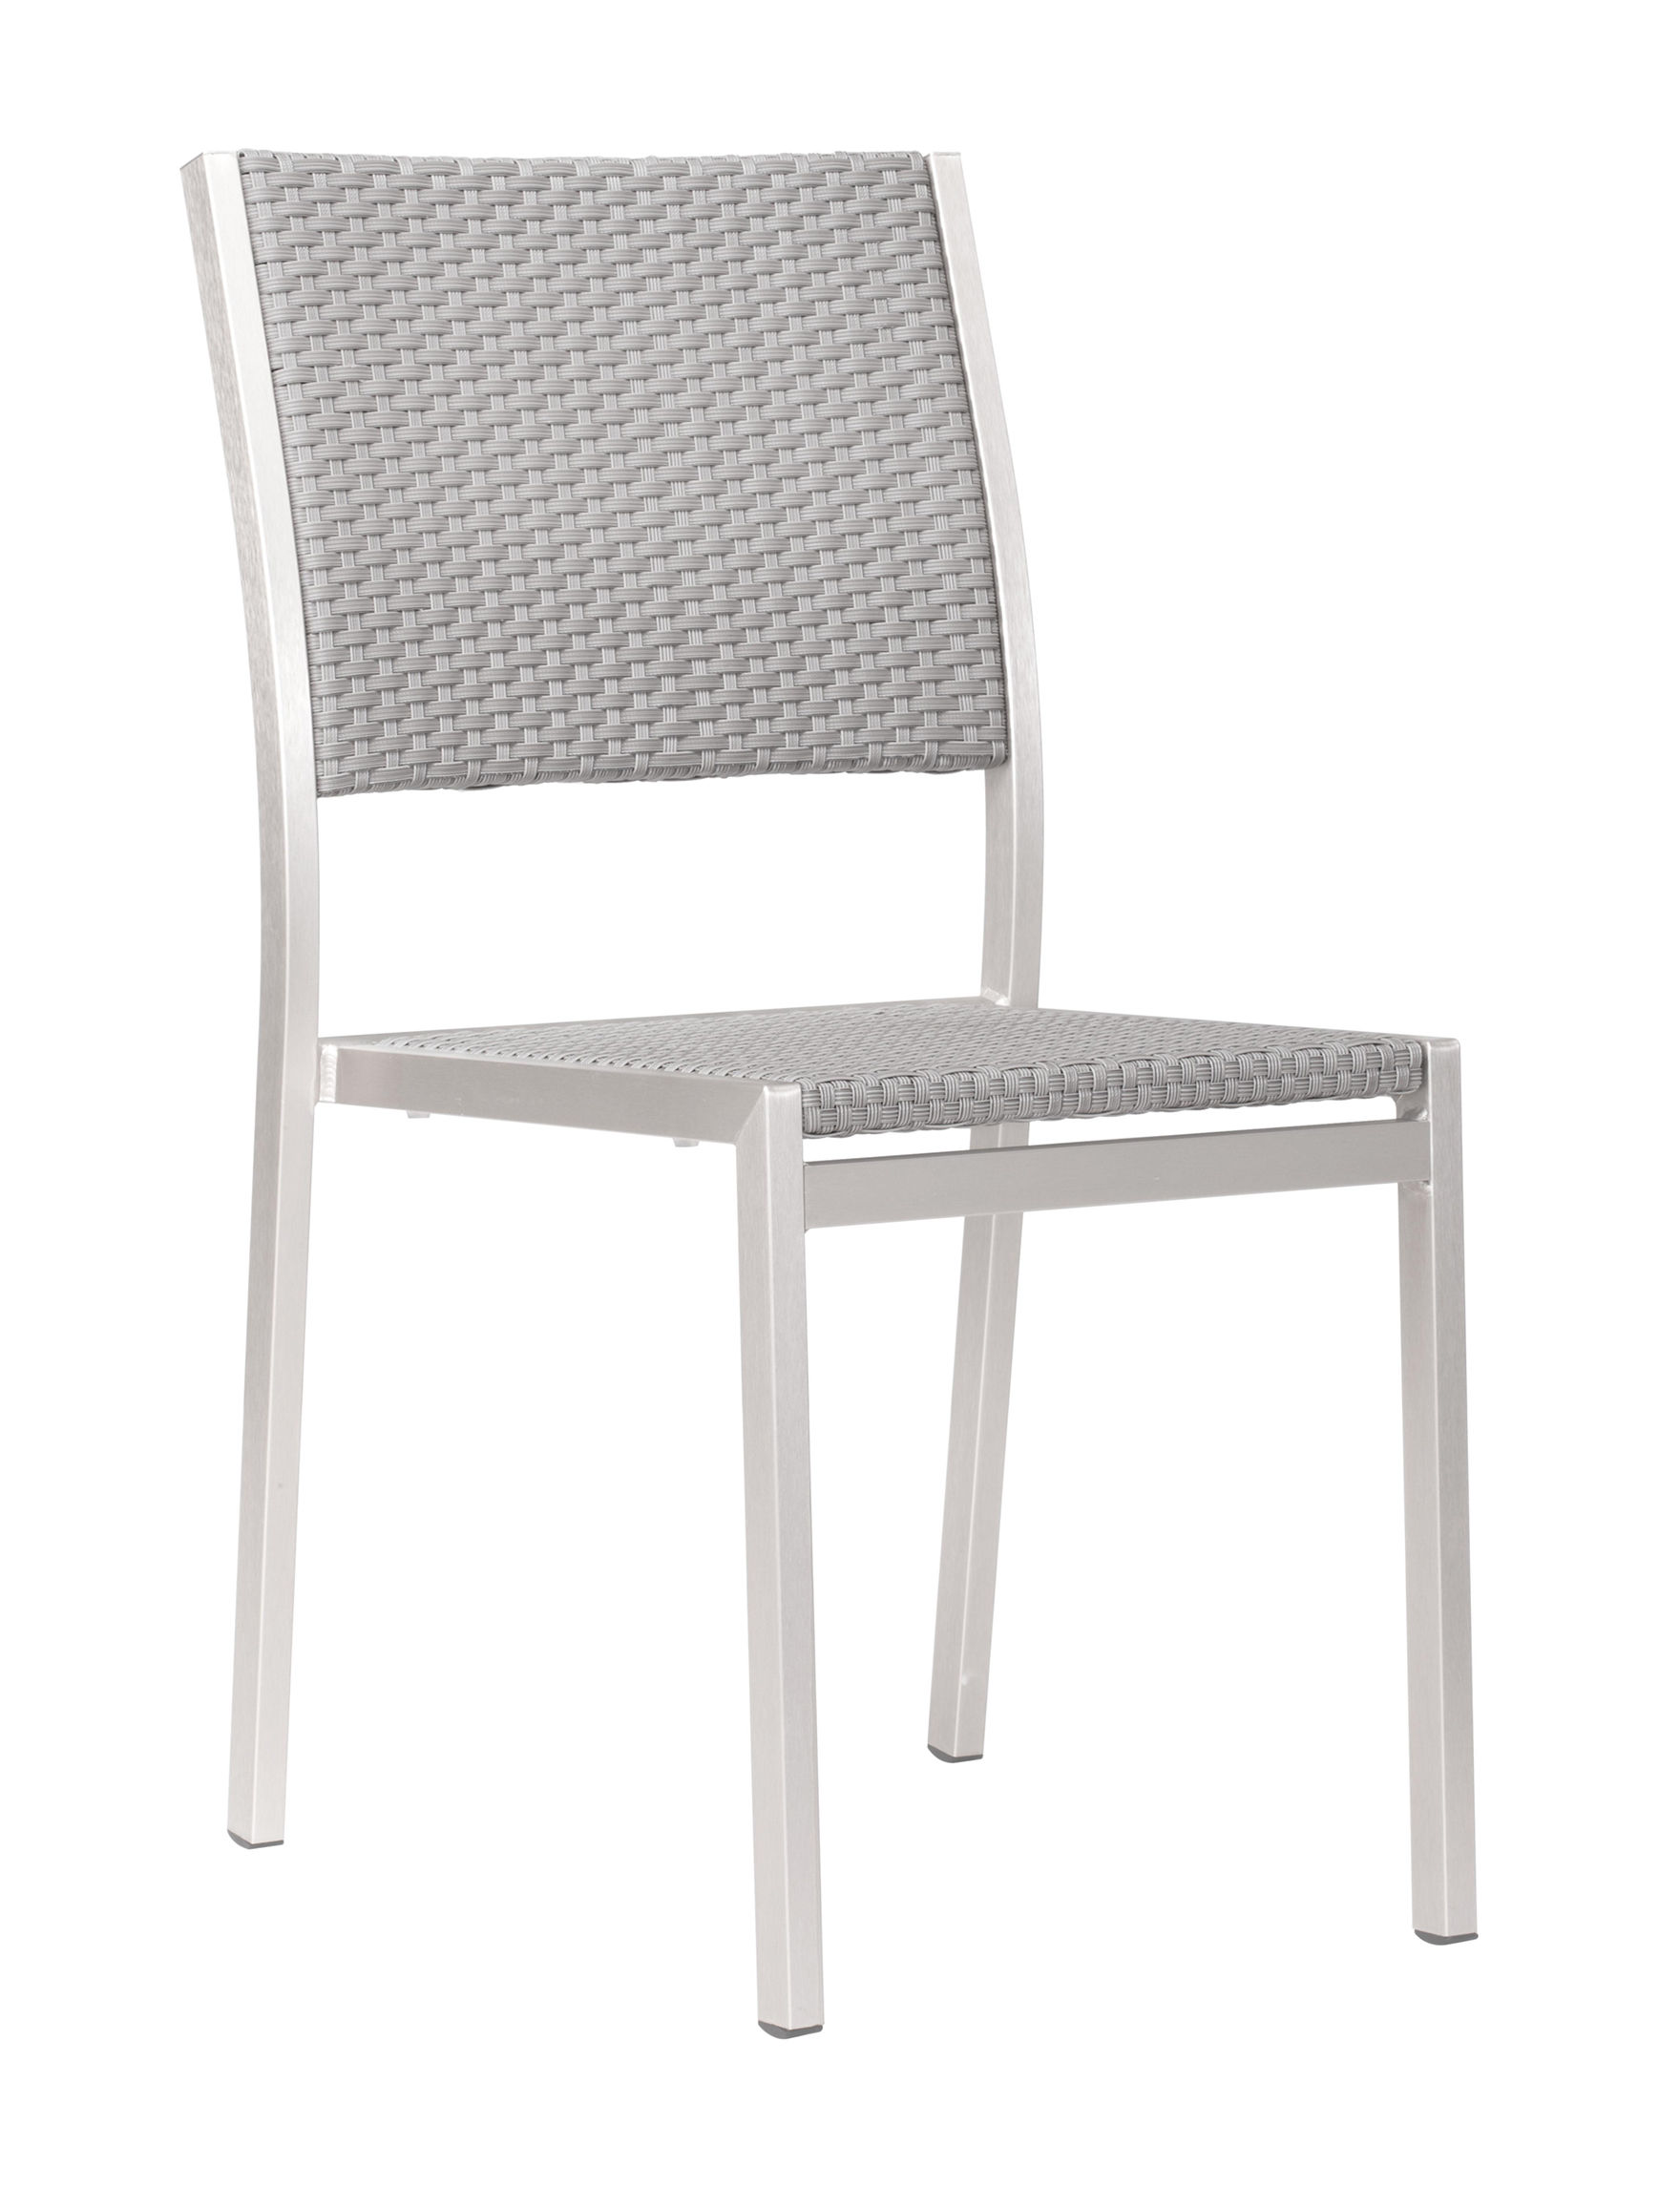 Zuo Vive Grey Patio & Outdoor Furniture